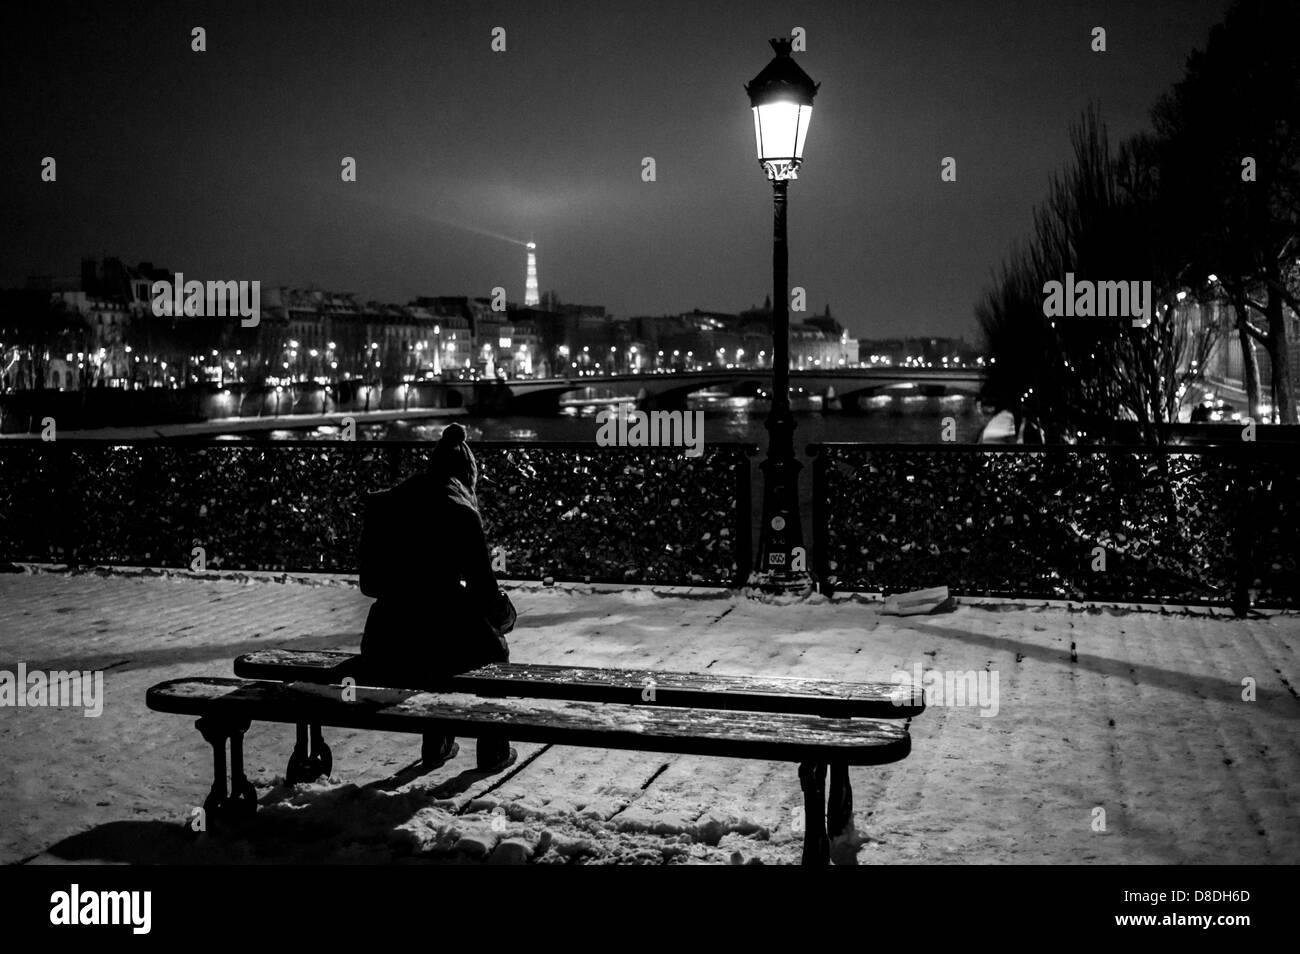 Person sitting alone on a Paris bridge at night. - Stock Image